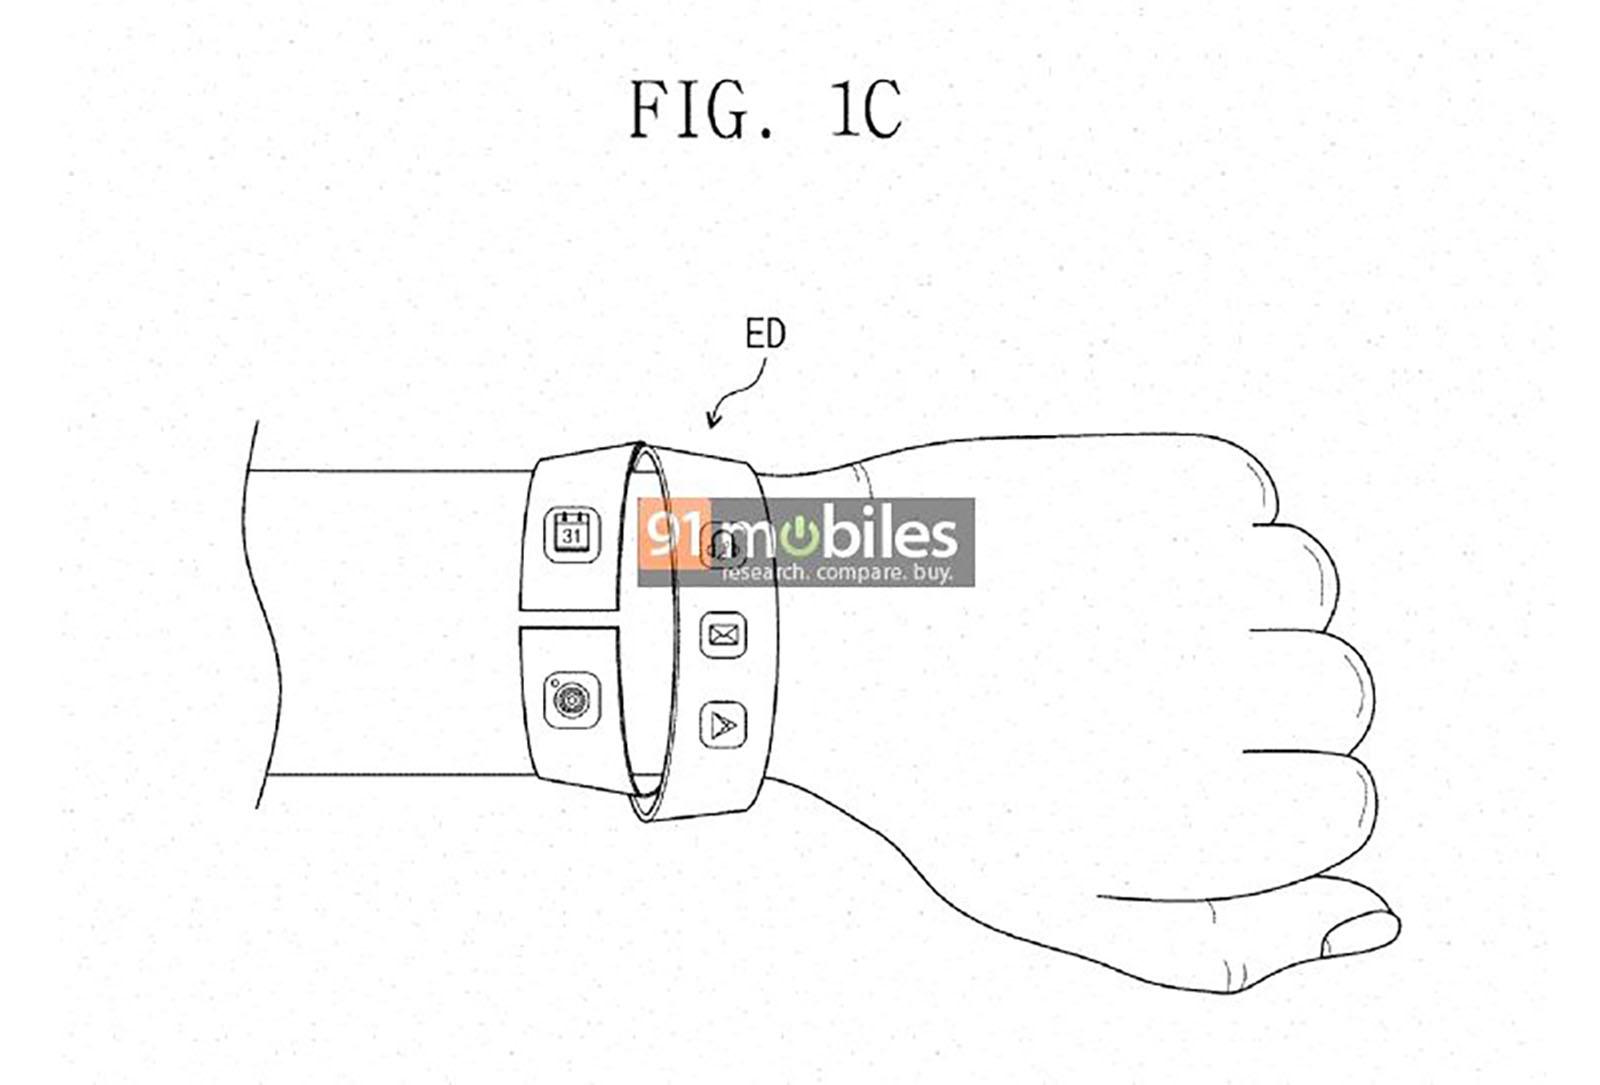 Samsung Smartband Patent